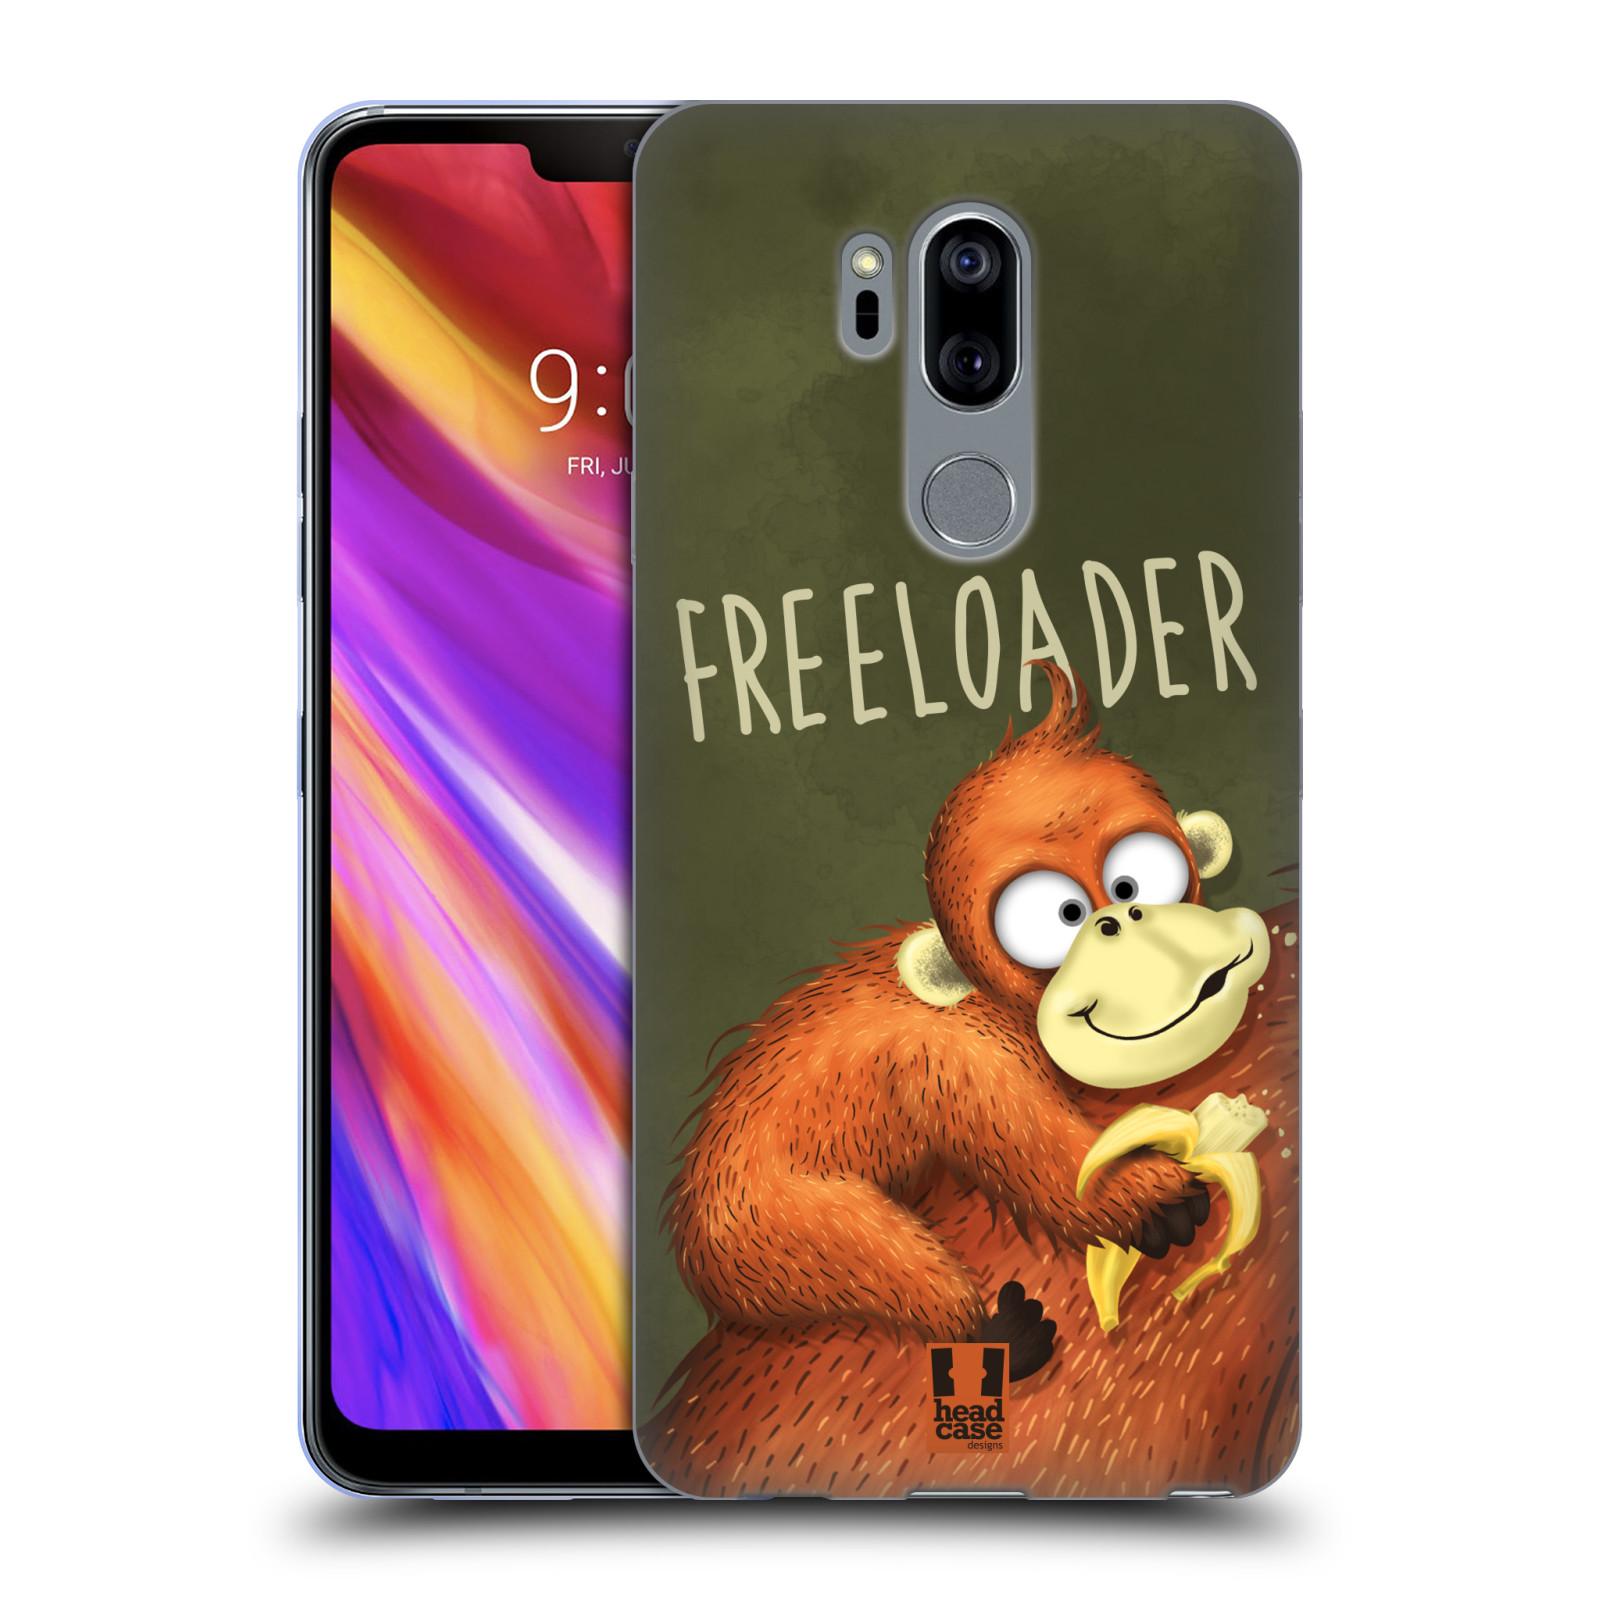 Silikonové pouzdro na mobil LG G7 ThinQ - Head Case - Opičák Freeloader